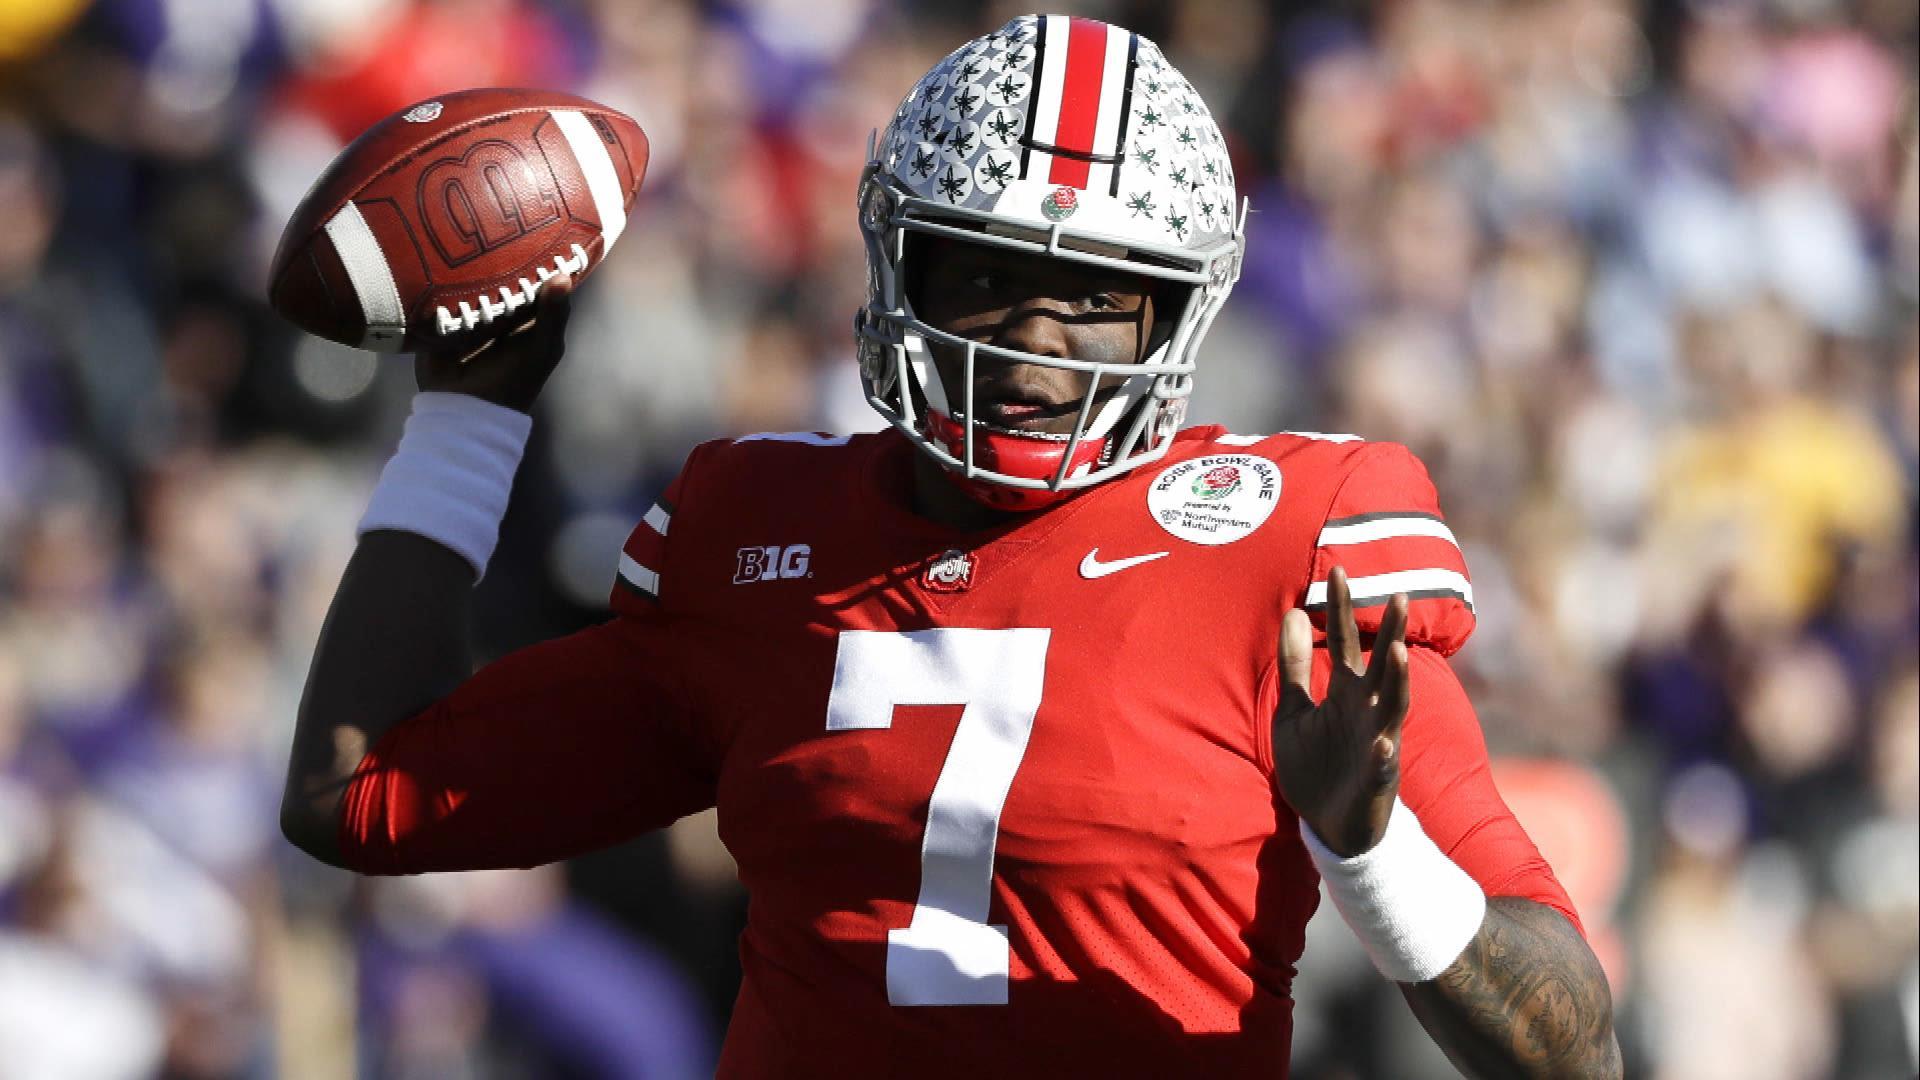 2019 NFL Draft: Is Dwayne Haskins the type of QB Jon Gruden wants?